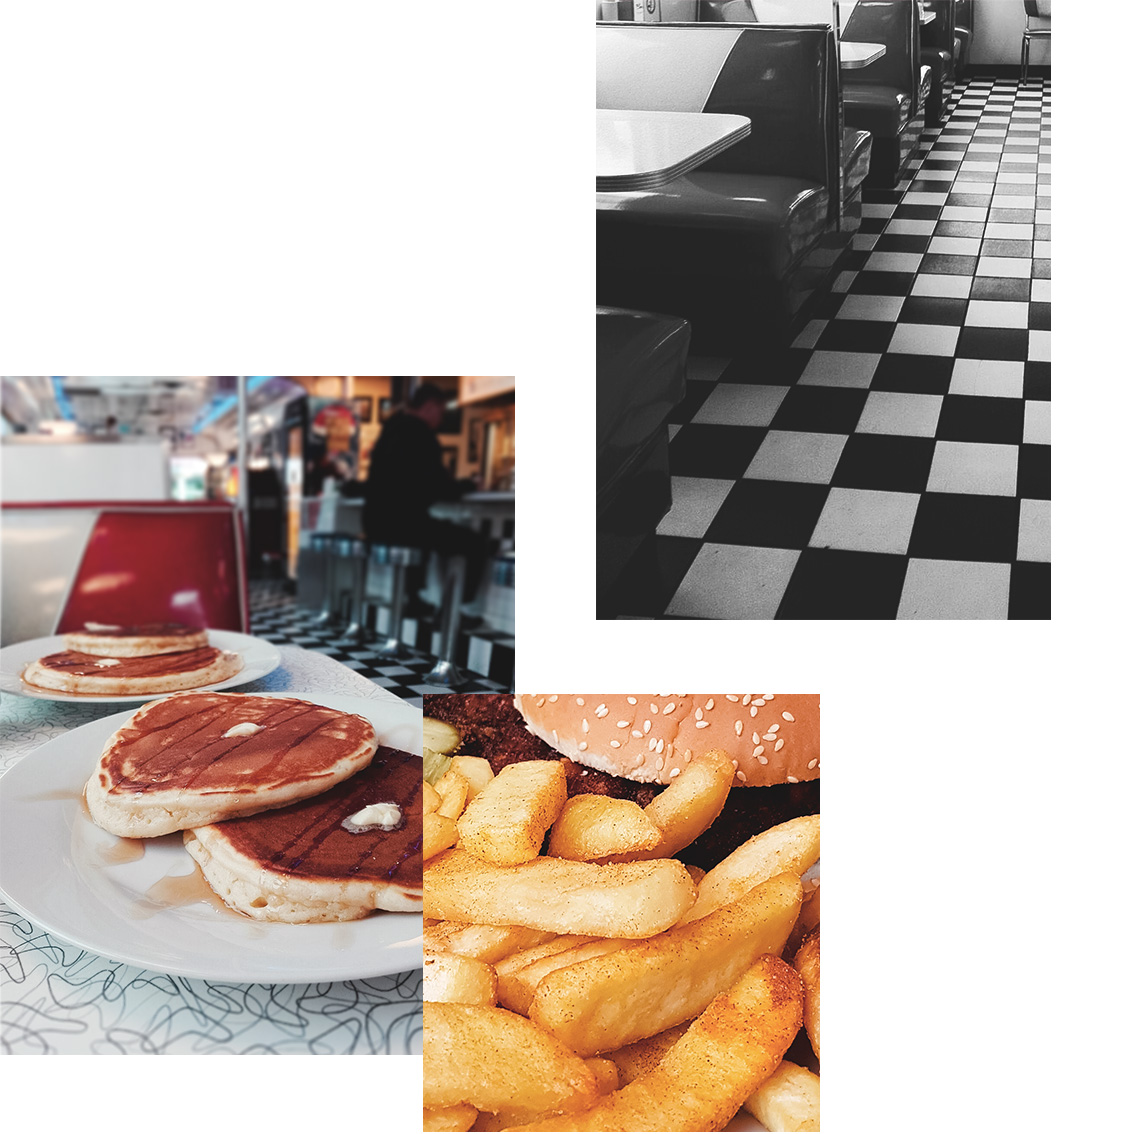 Mels Diner und Knoblauch Parmesan Pommes